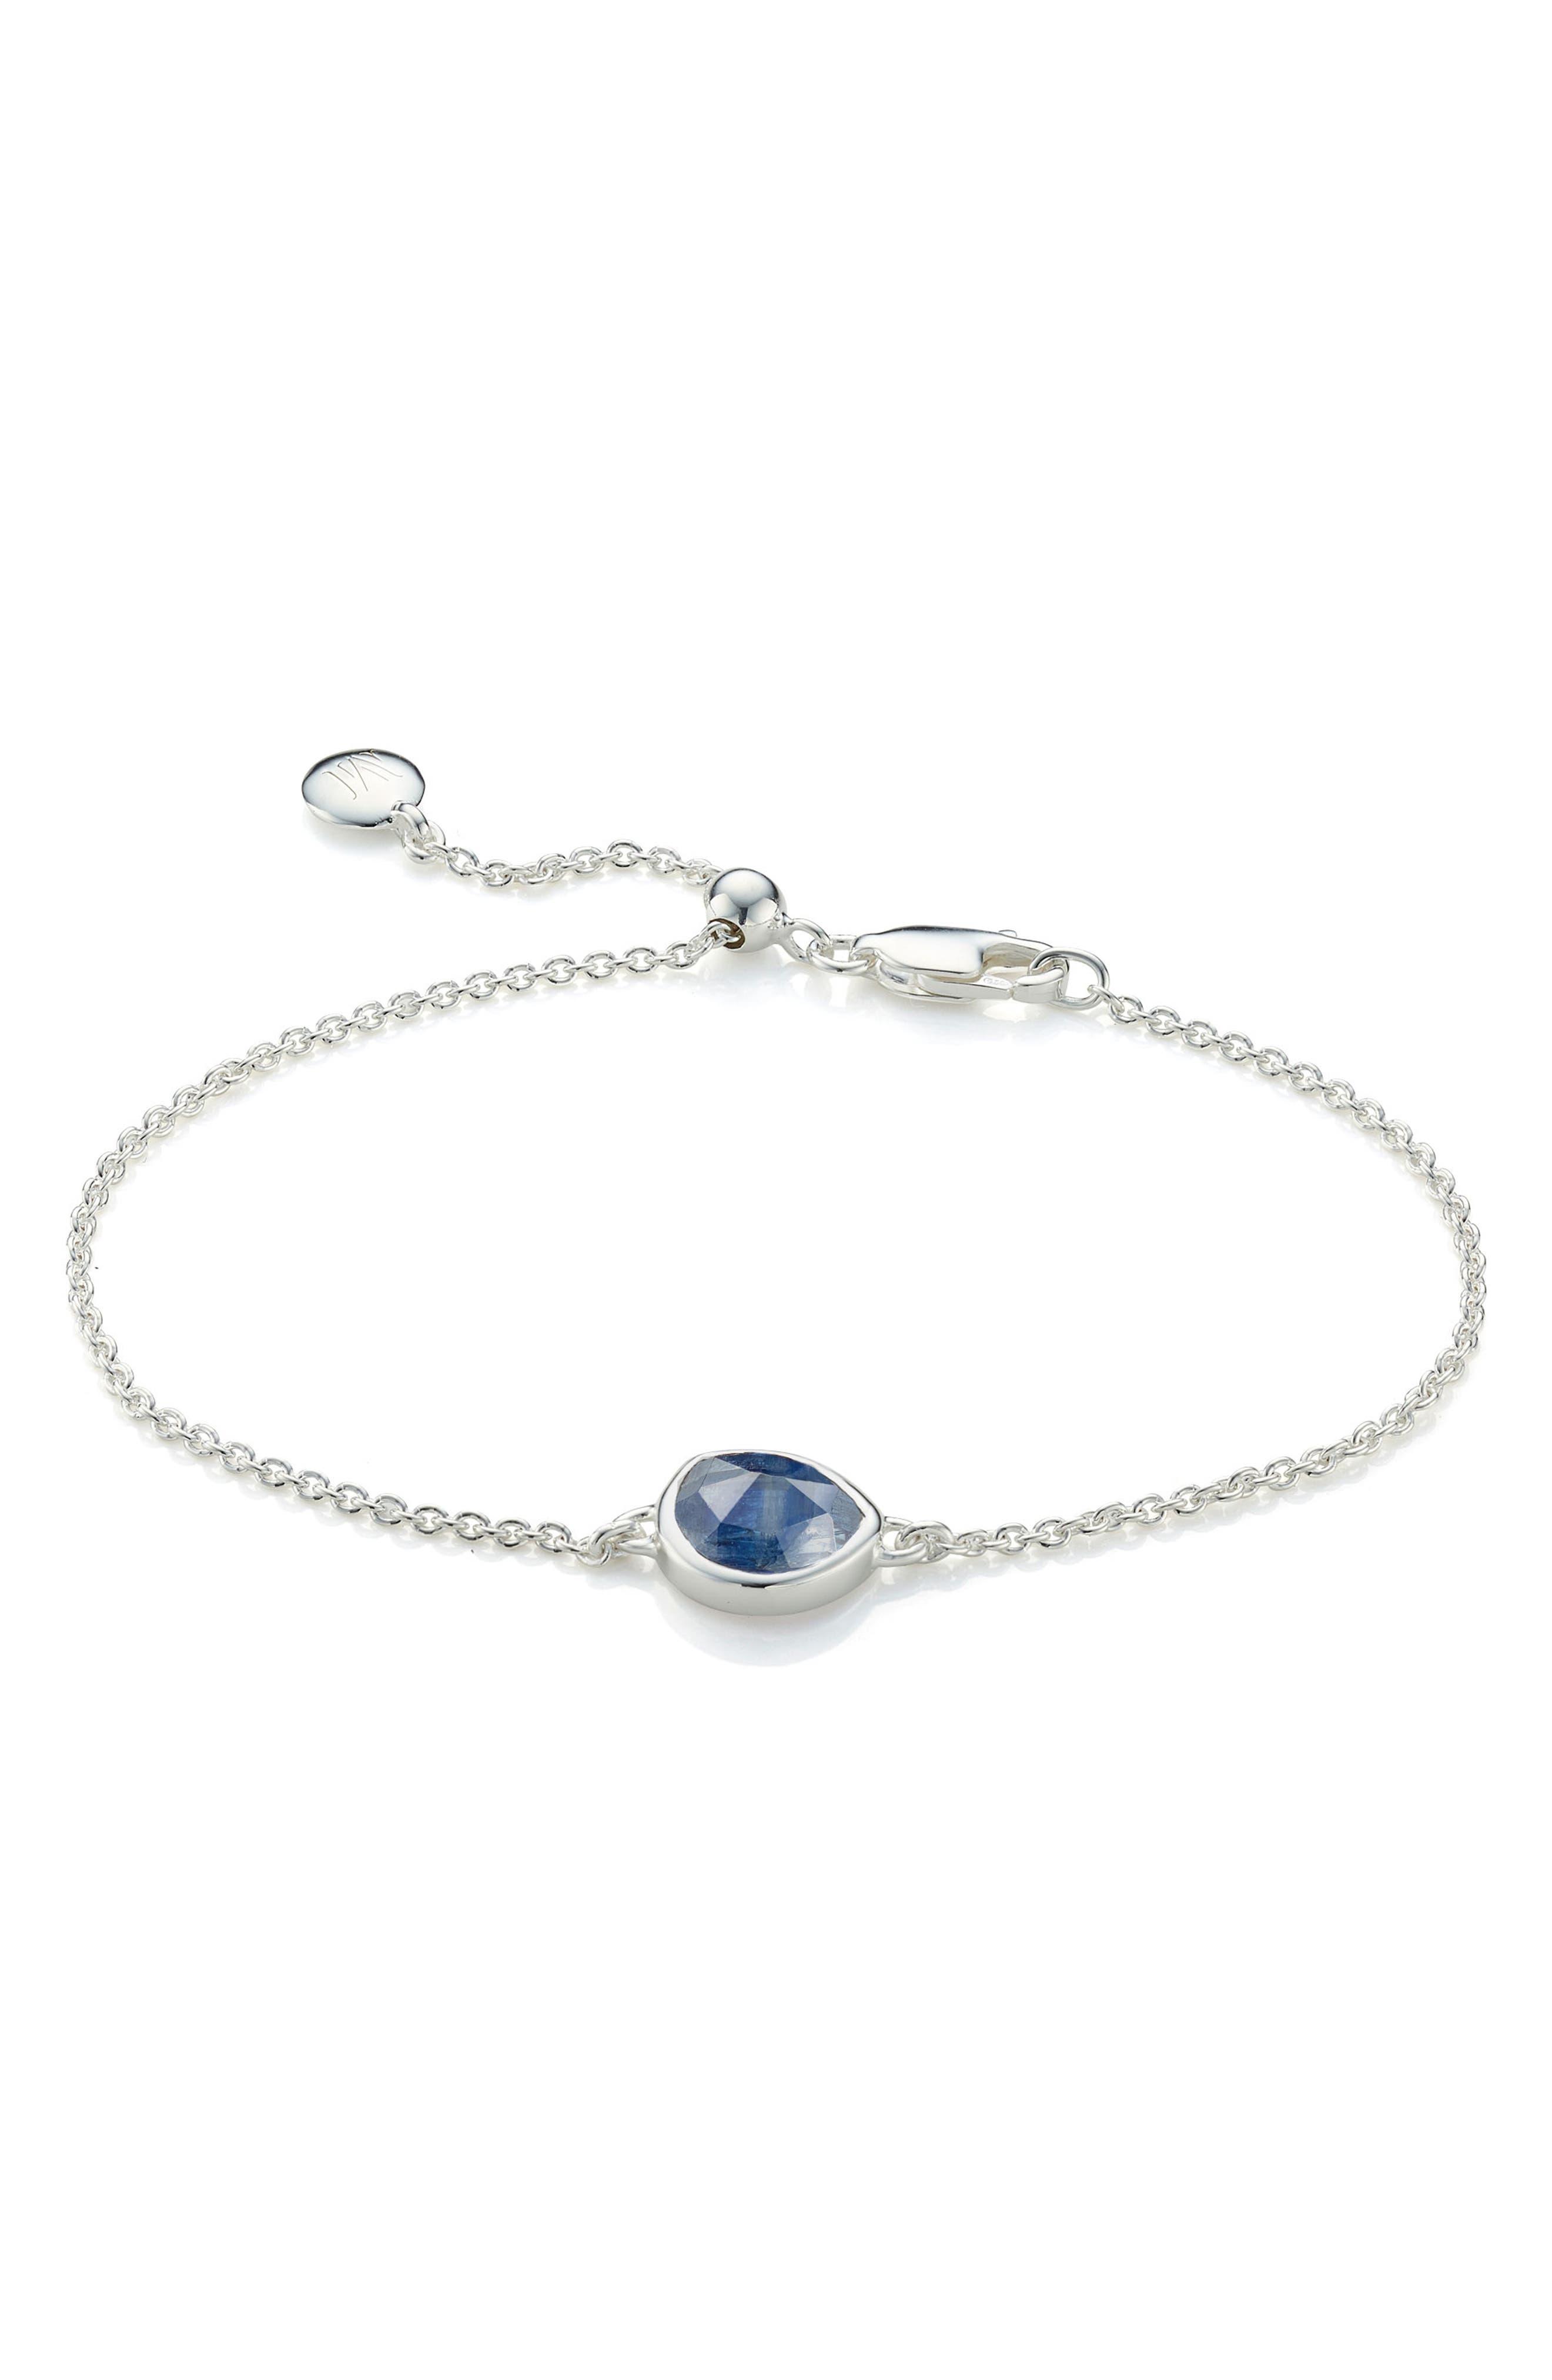 Siren Semiprecious Stone Bracelet,                             Main thumbnail 1, color,                             SILVER/ KYANITE